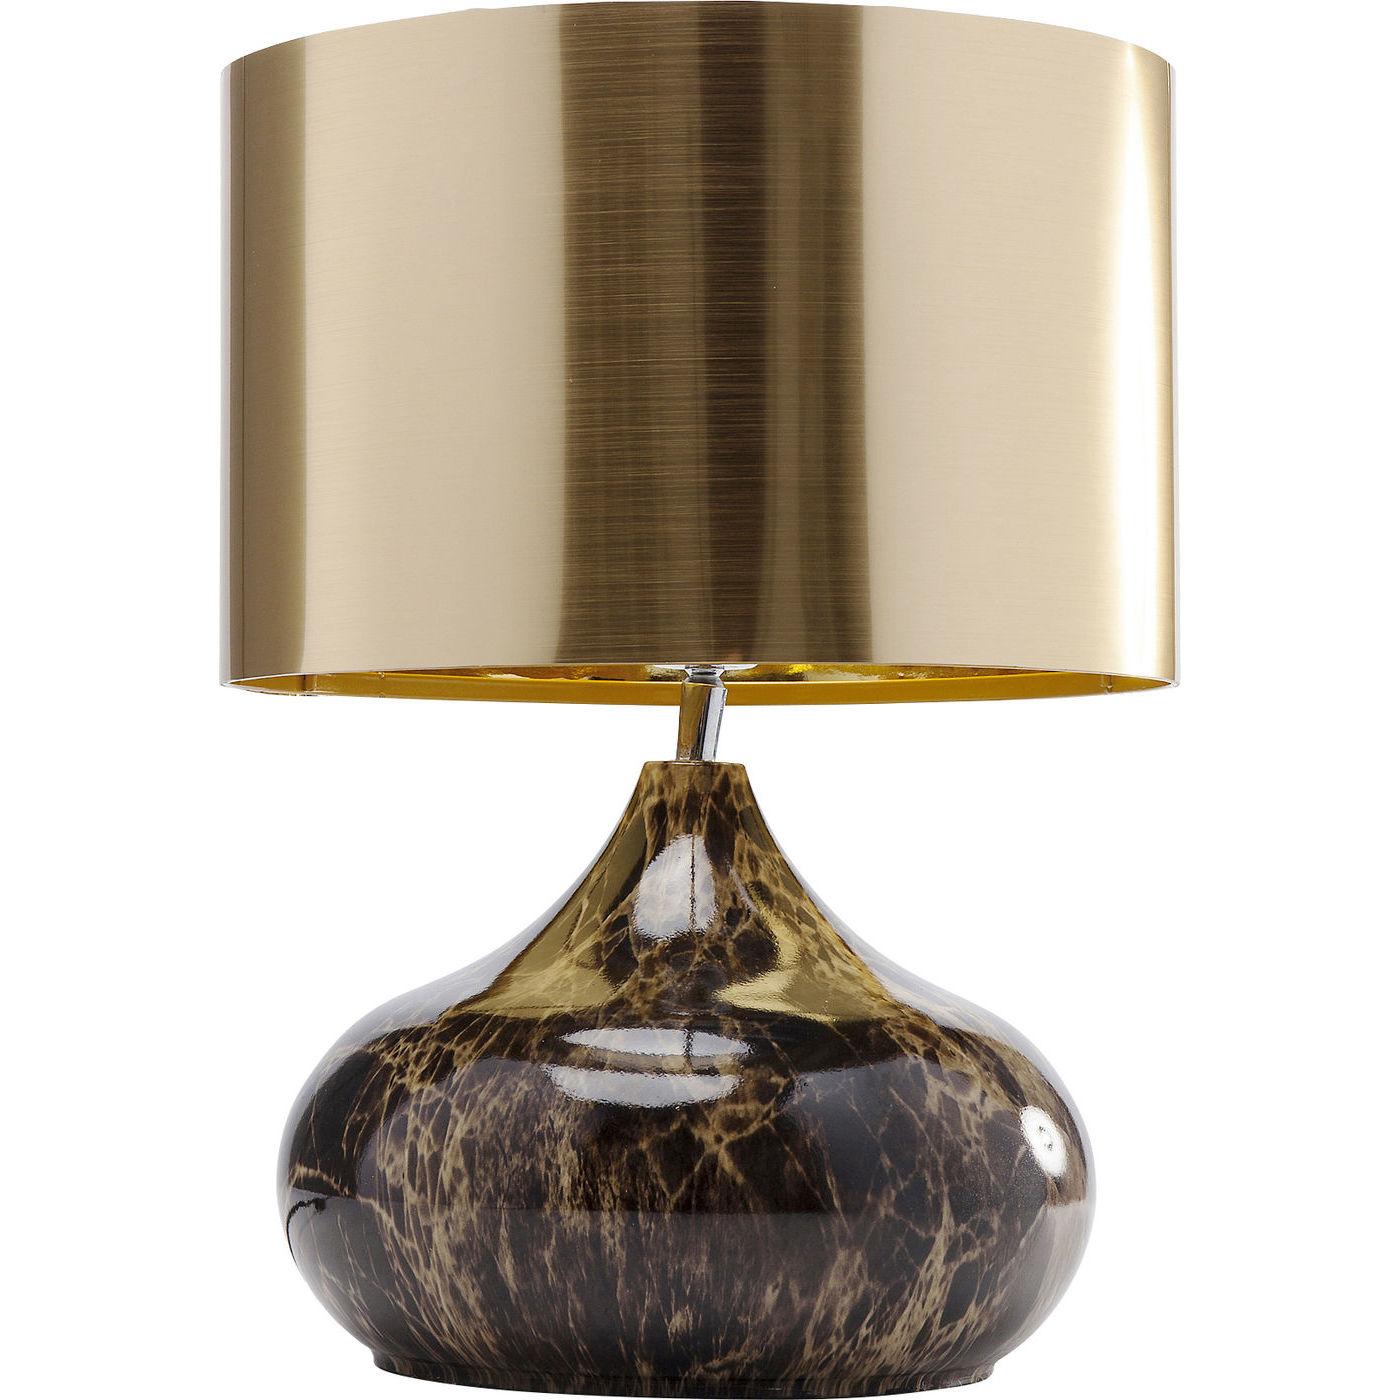 Kare design mamo deluxe bordlampe - guld plastik/brunt stål fra kare design fra boboonline.dk